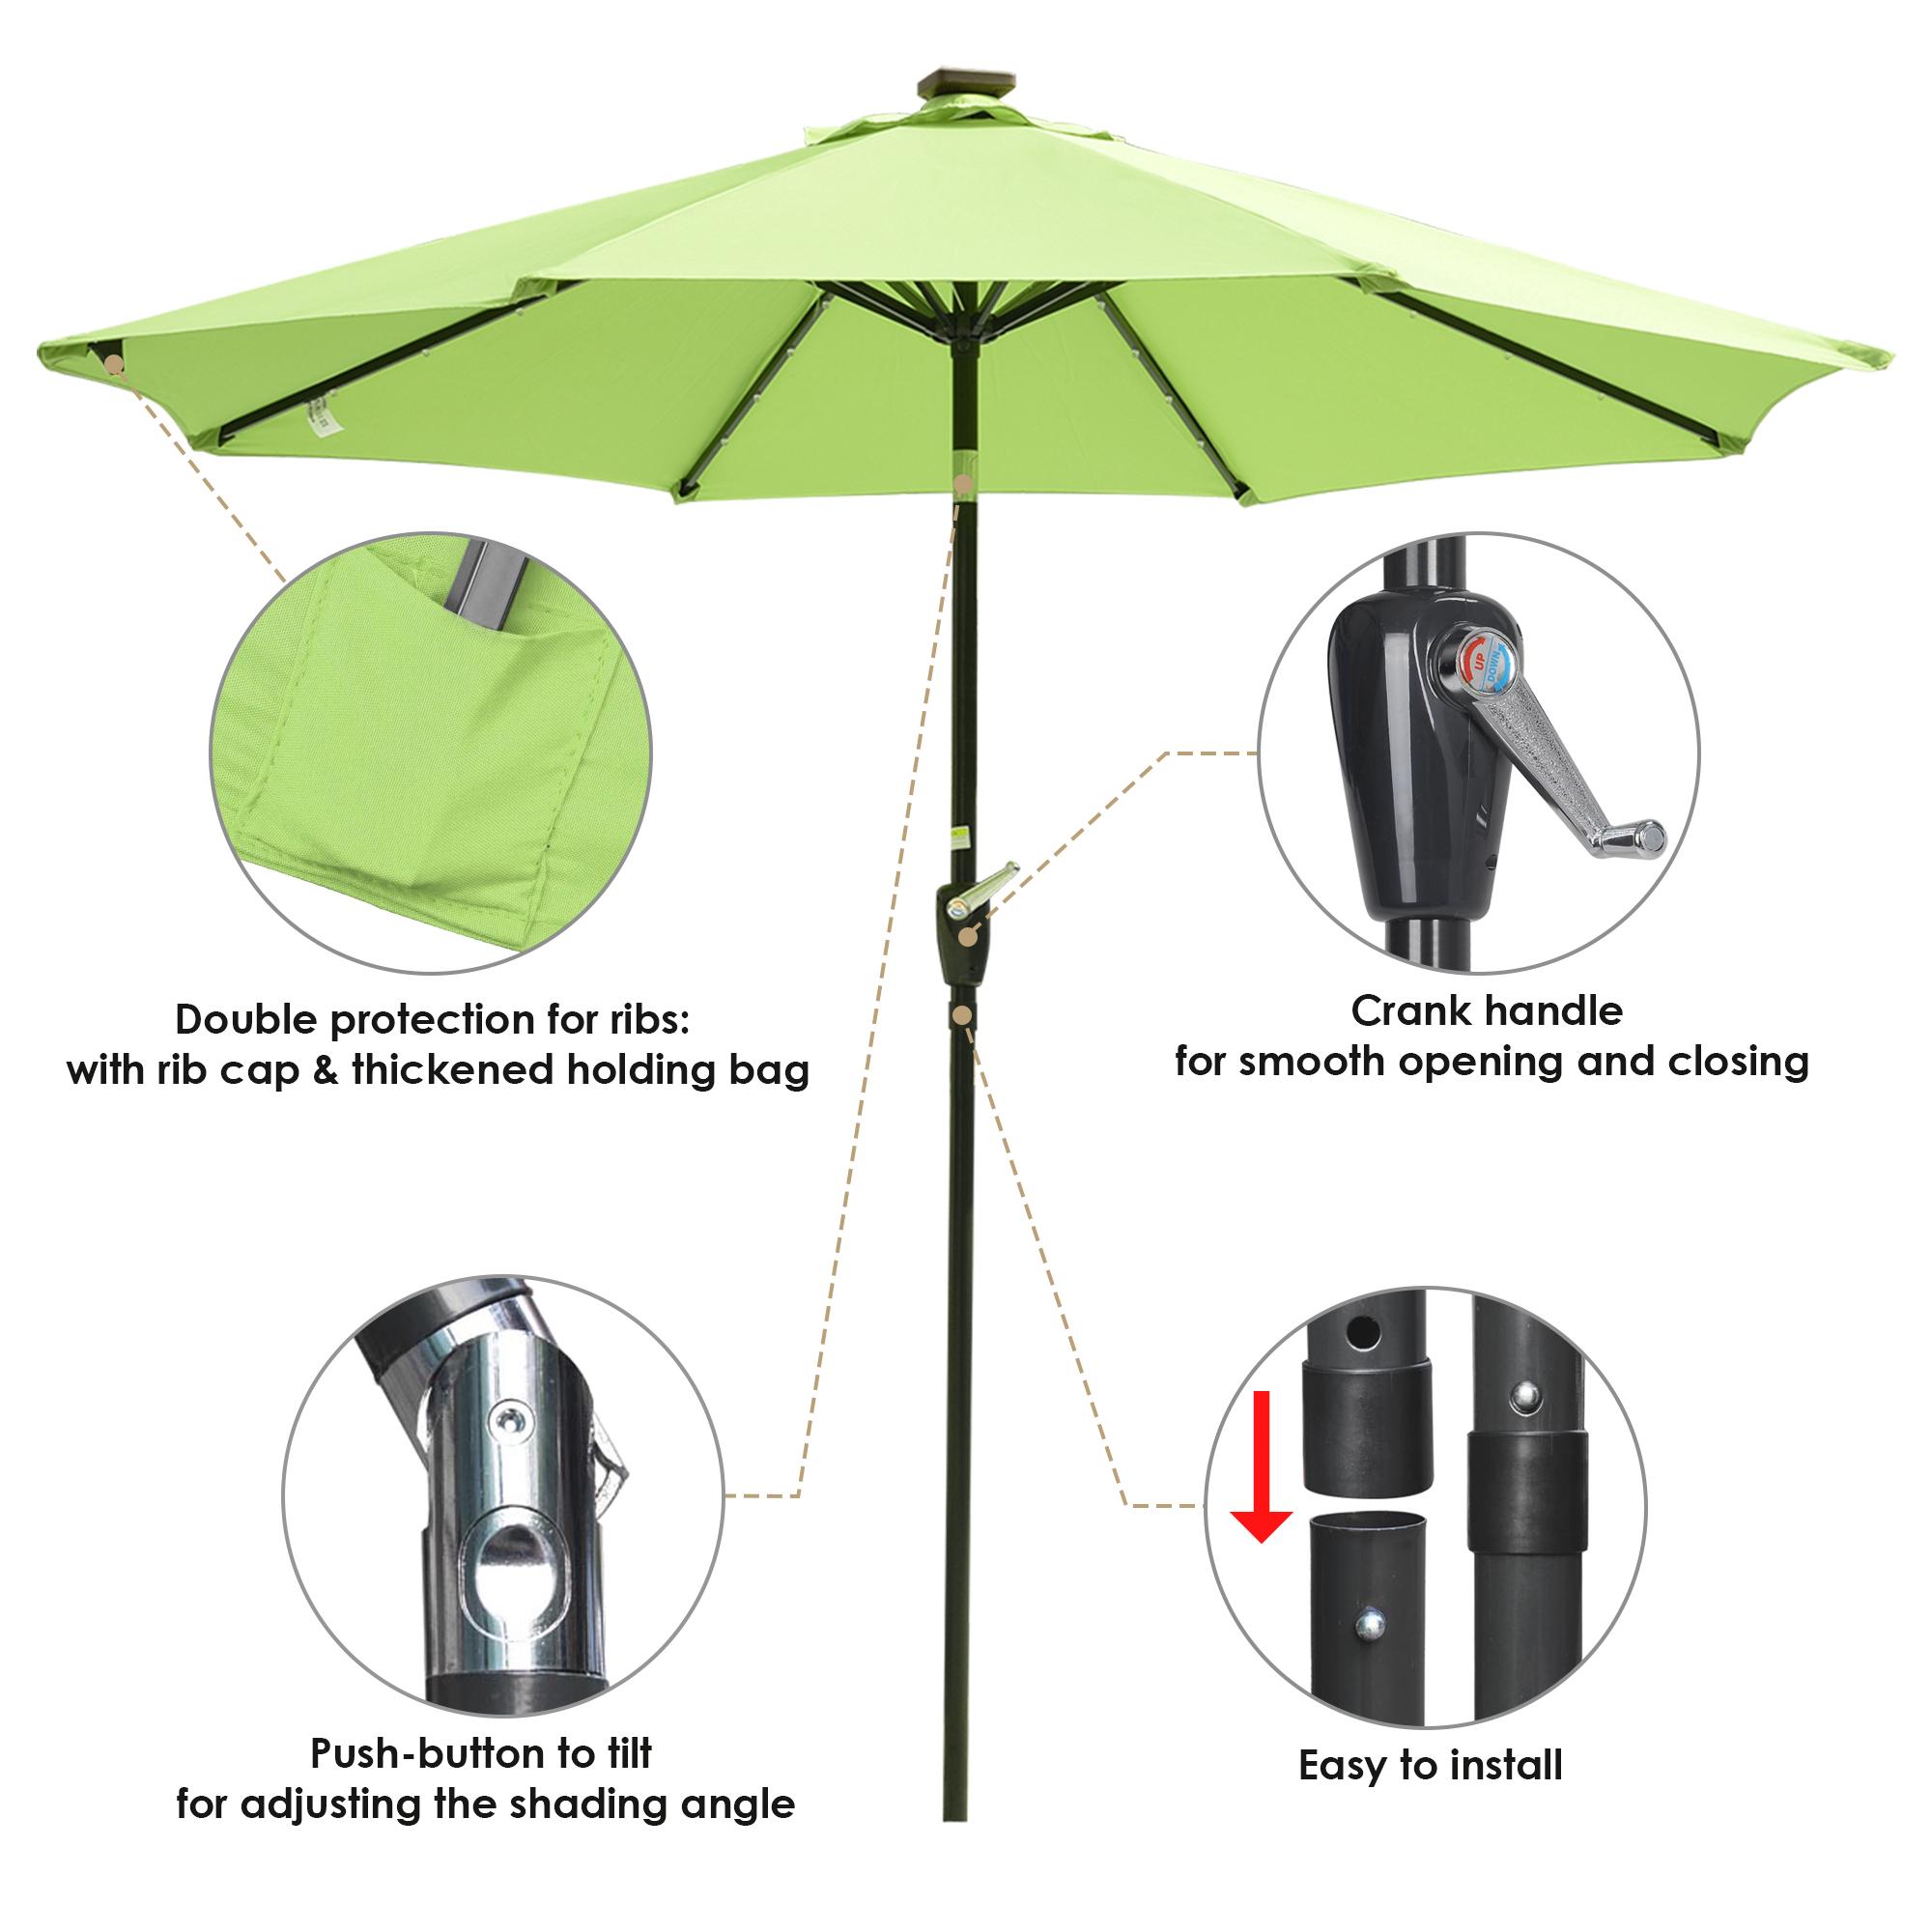 thumbnail 17 - 9' Patio Outdoor Umbrella Solar LED 8 Rib Garden Parasol Yard Deck Table Shade